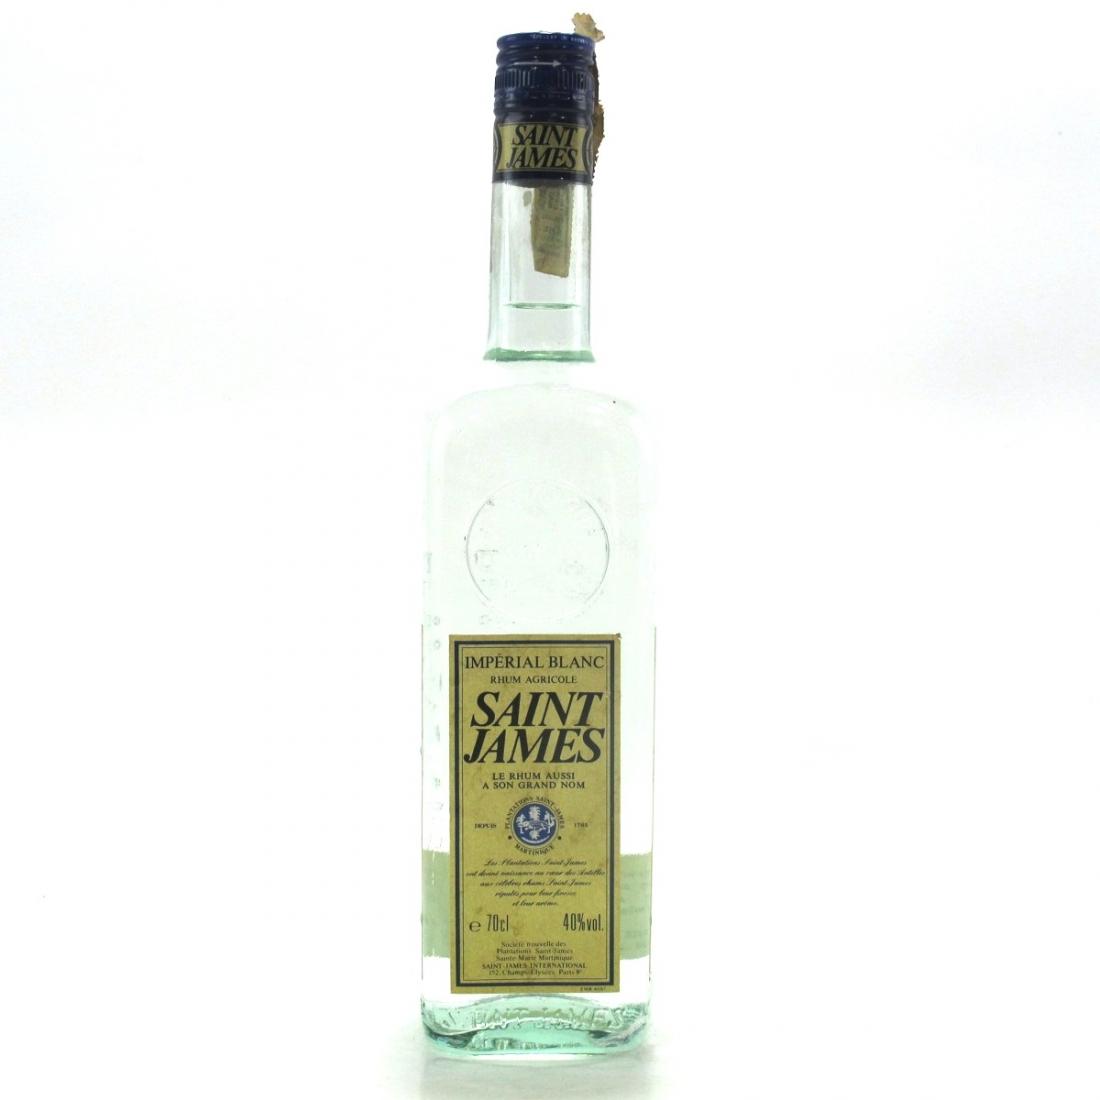 Saint James Imperial Blanc Rhum Agricole